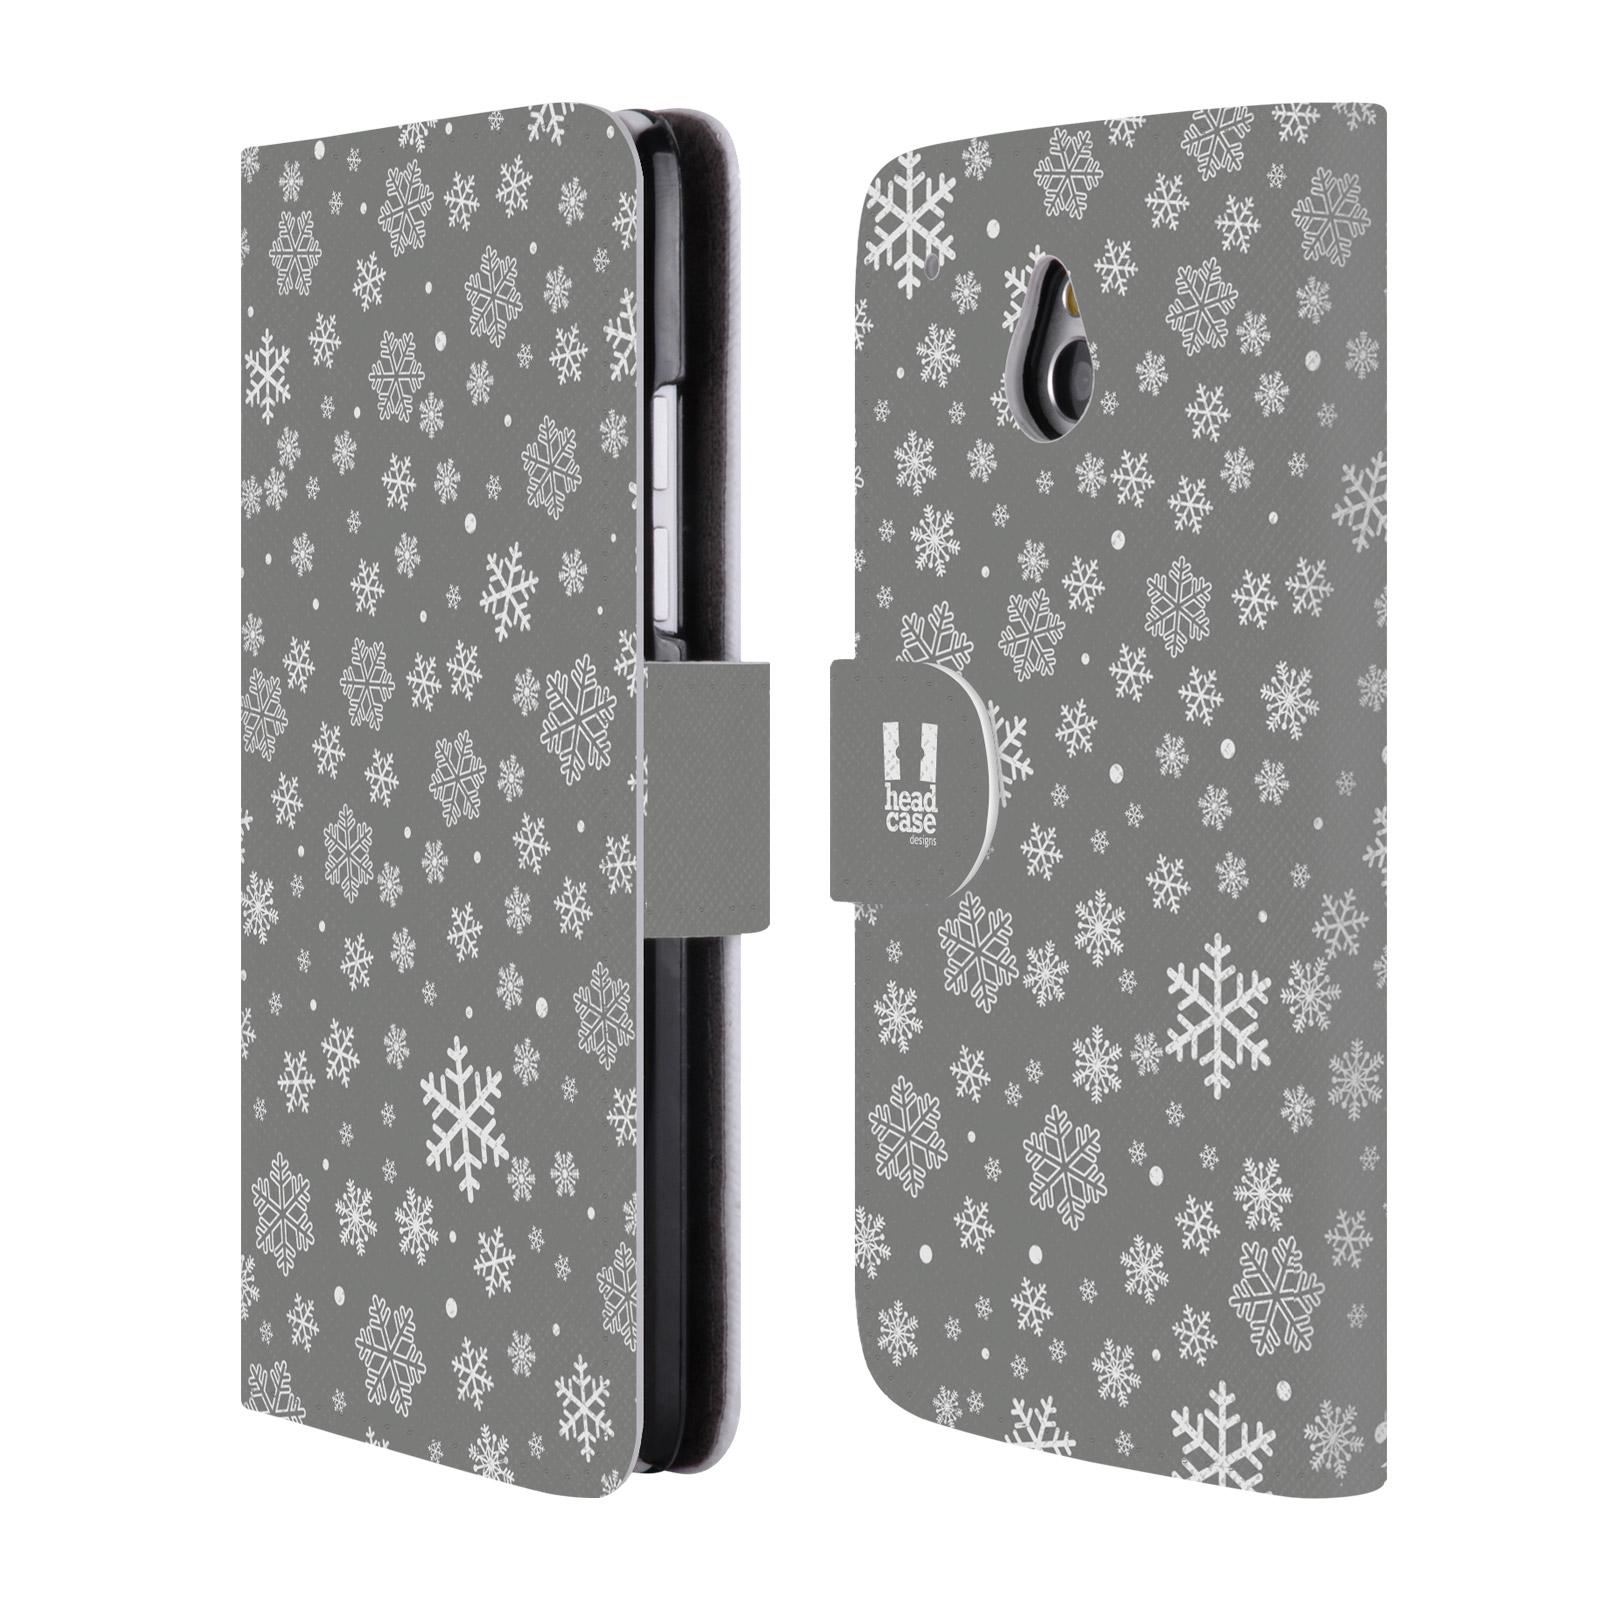 HEAD CASE Flipové pouzdro pro mobil HTC ONE MINI (M4) stříbrné vzory sněžná vločka